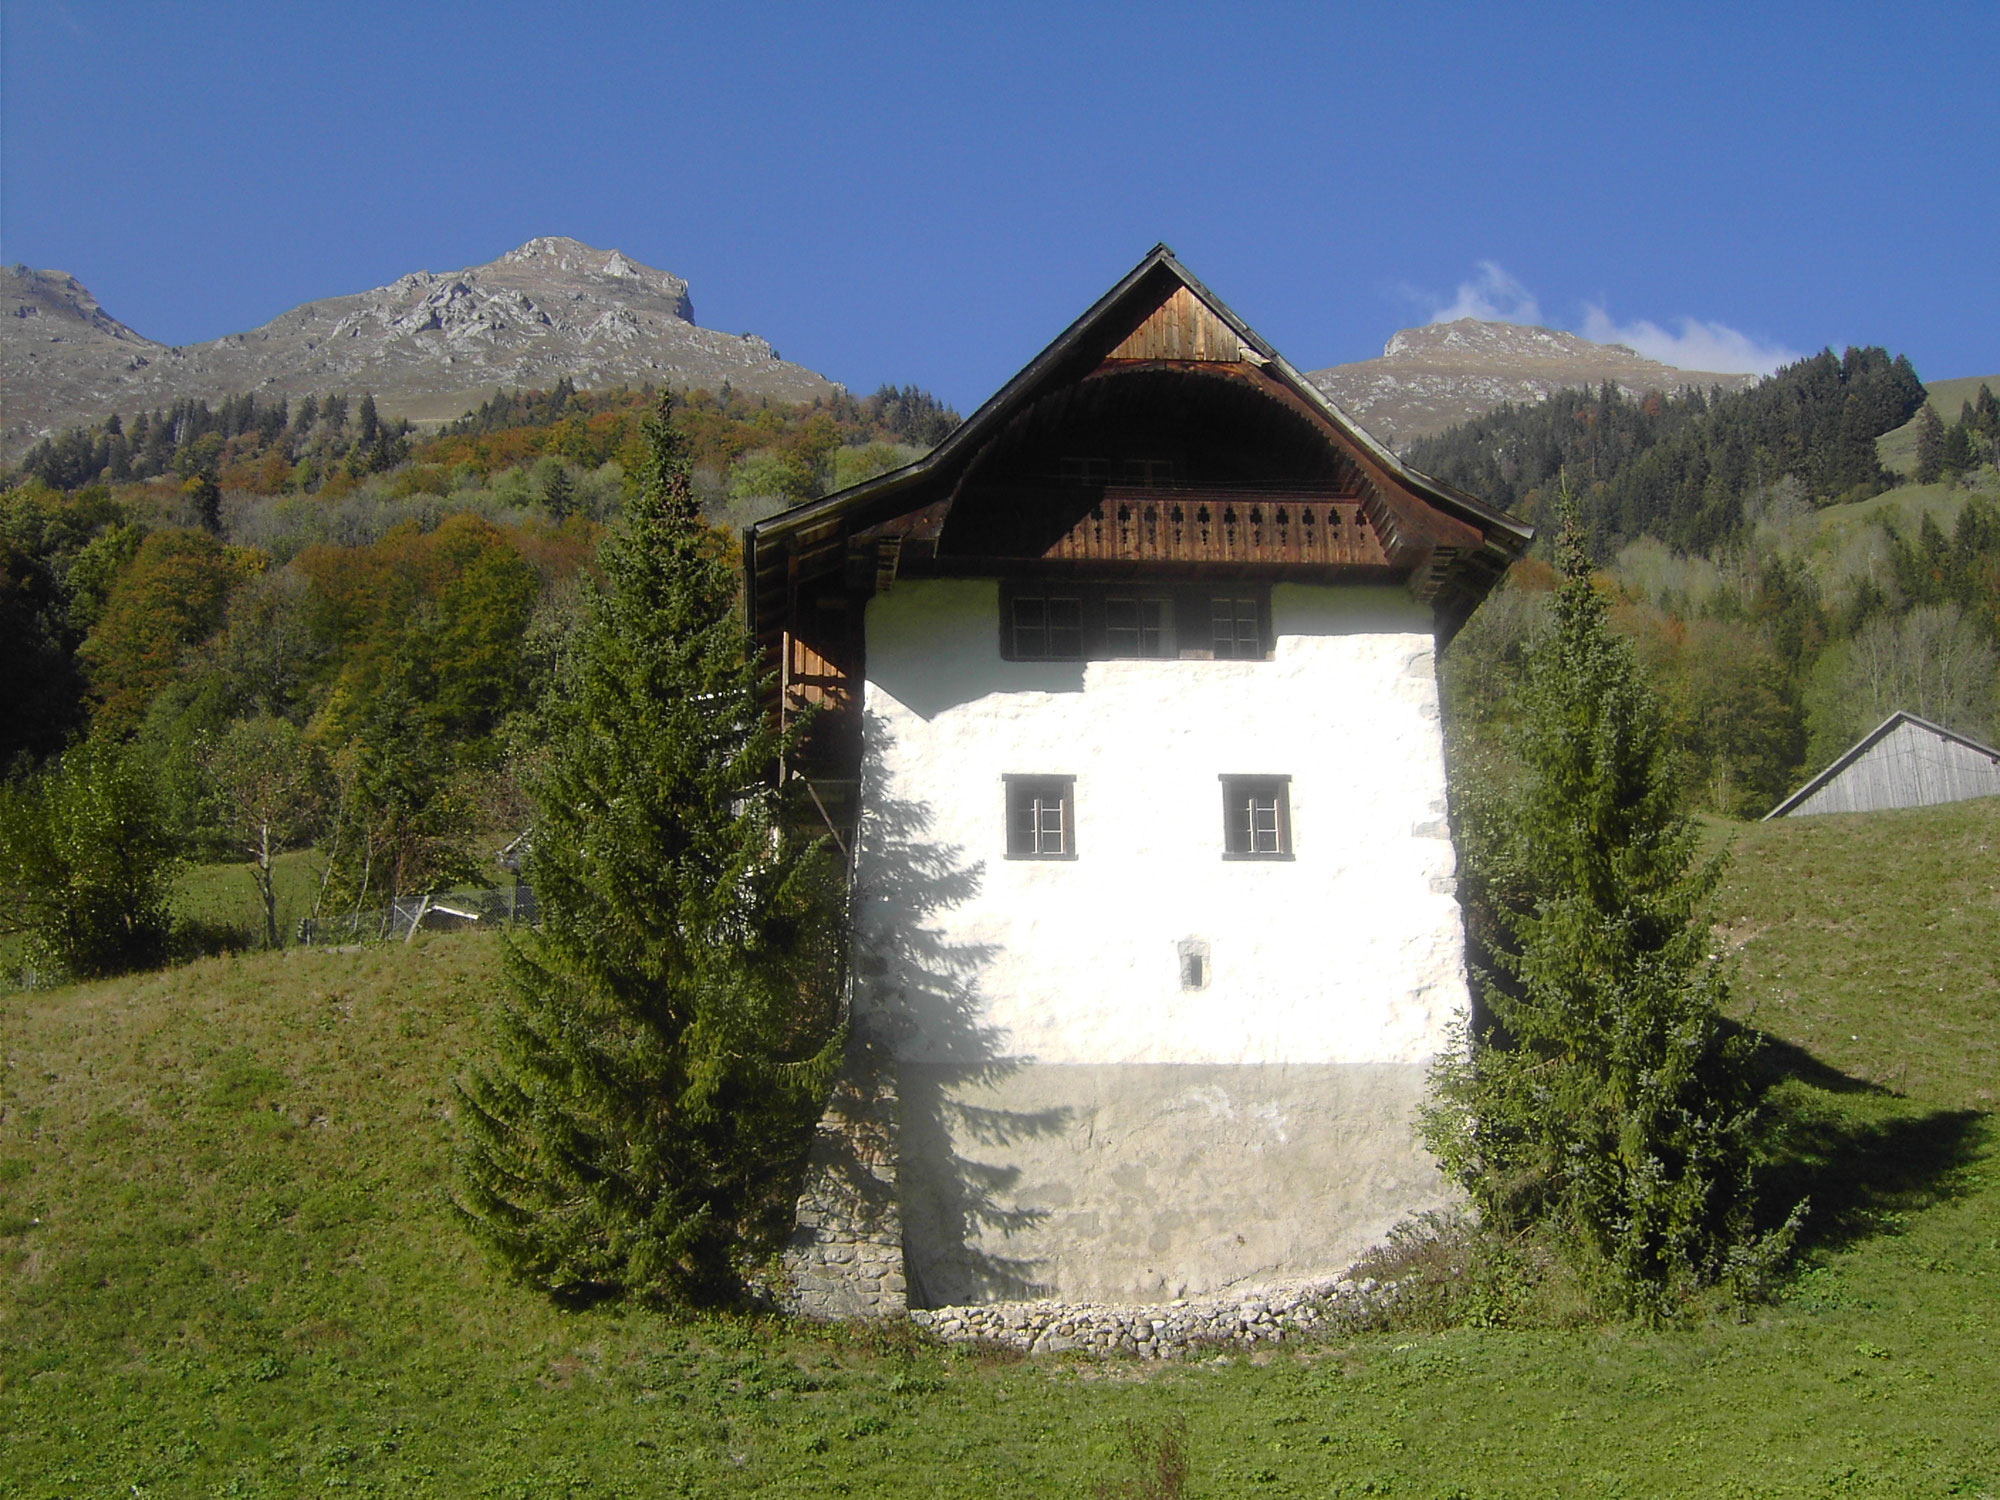 Jauner Unterkünfte-Ferienhaus Tempel